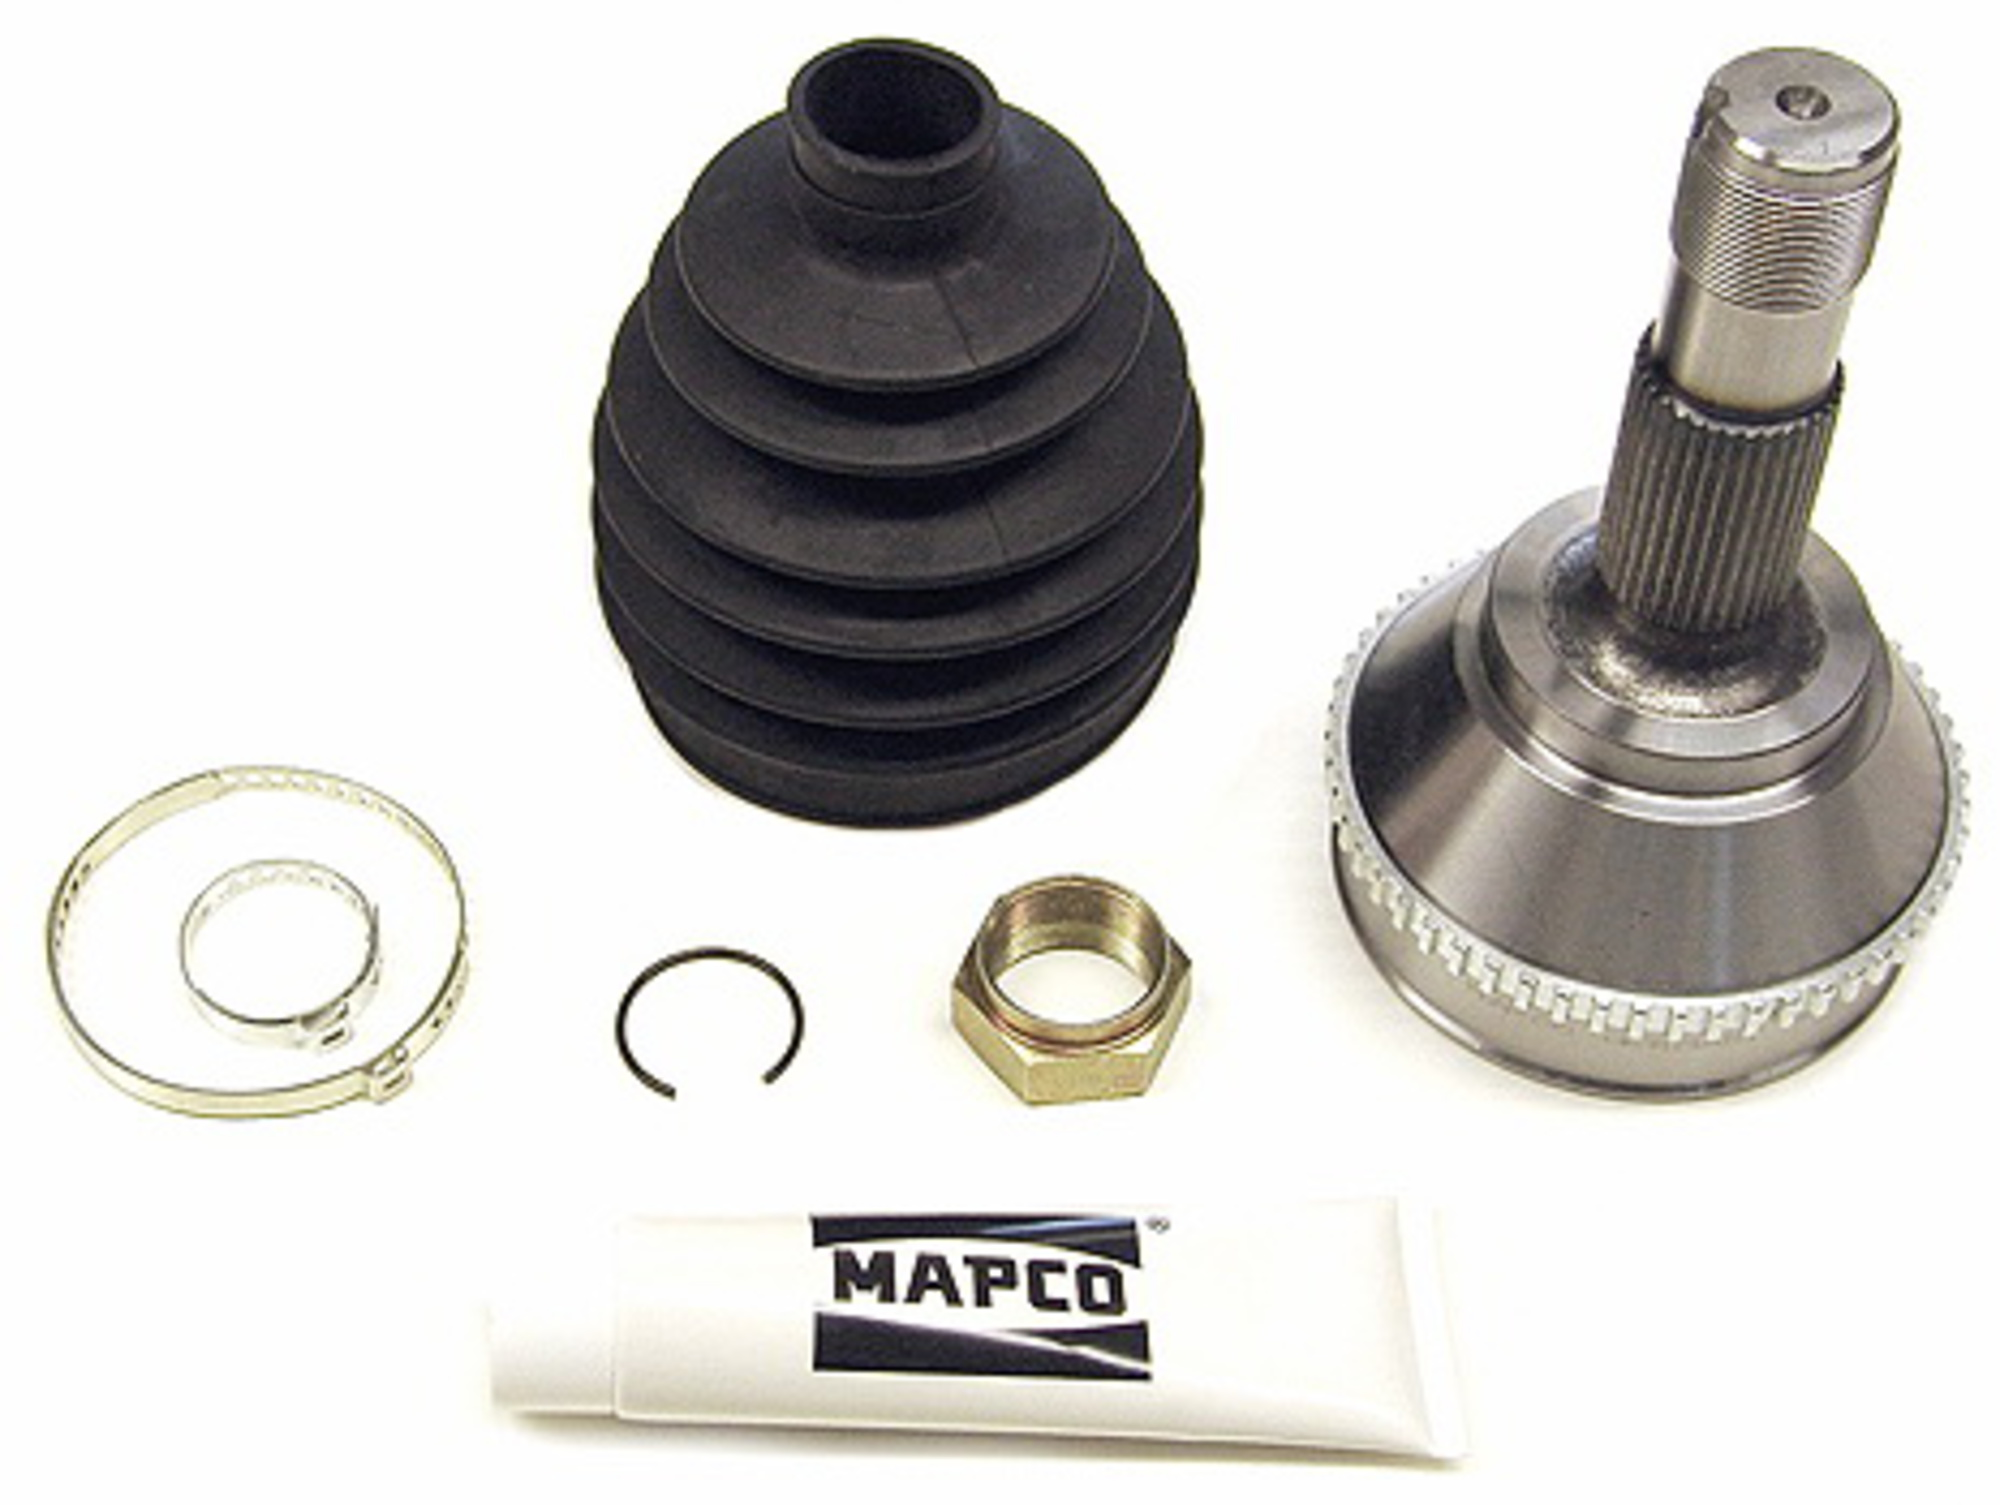 MAPCO 16011 Kit de articulación, árbol de transmisión